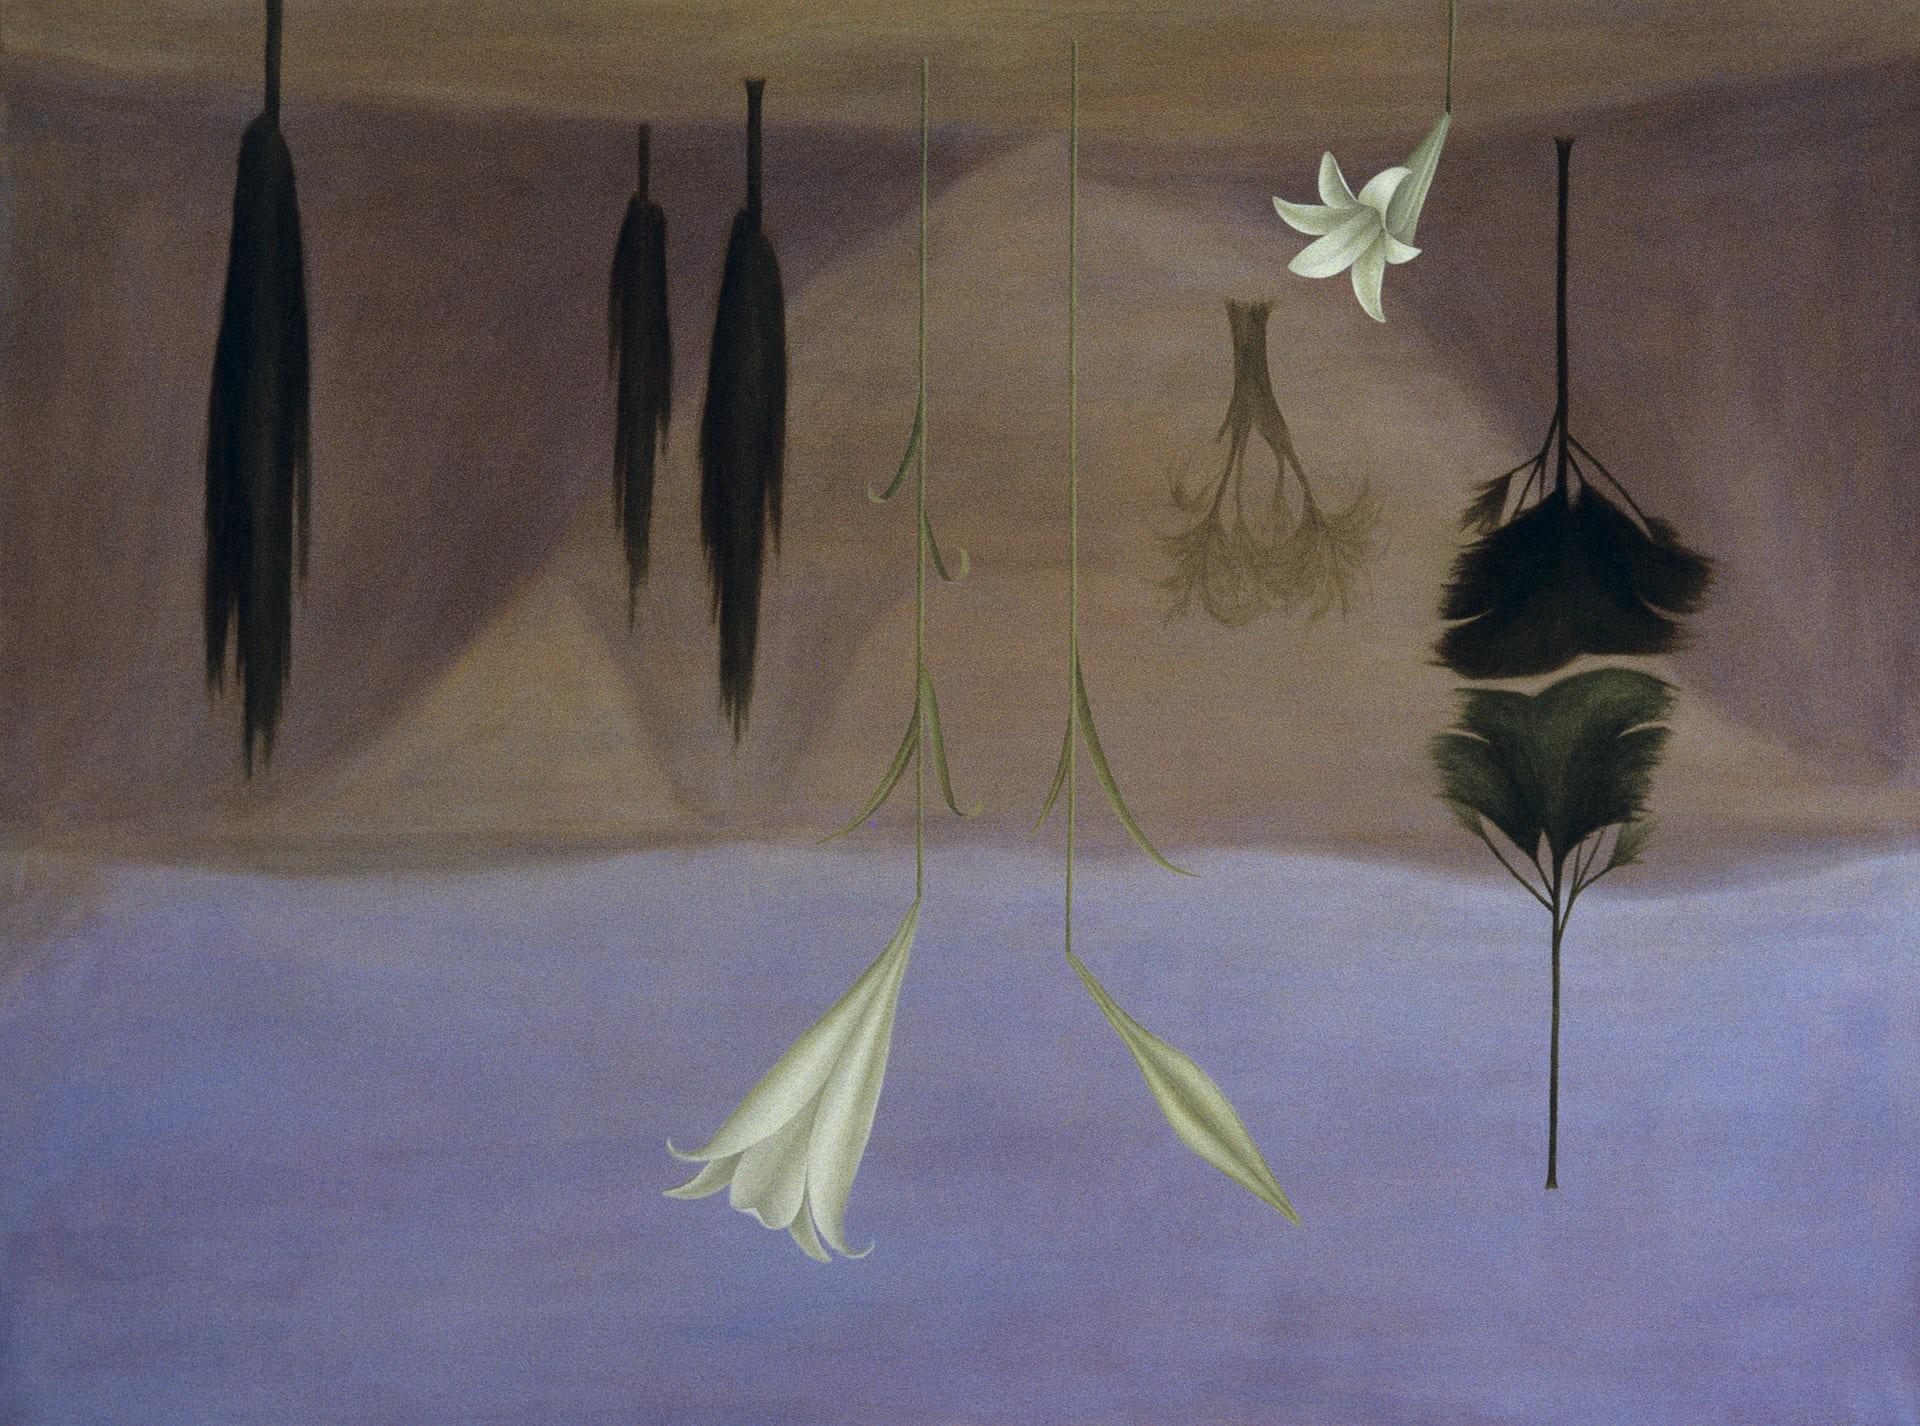 the enigmatic art of Rosslynd Piggott